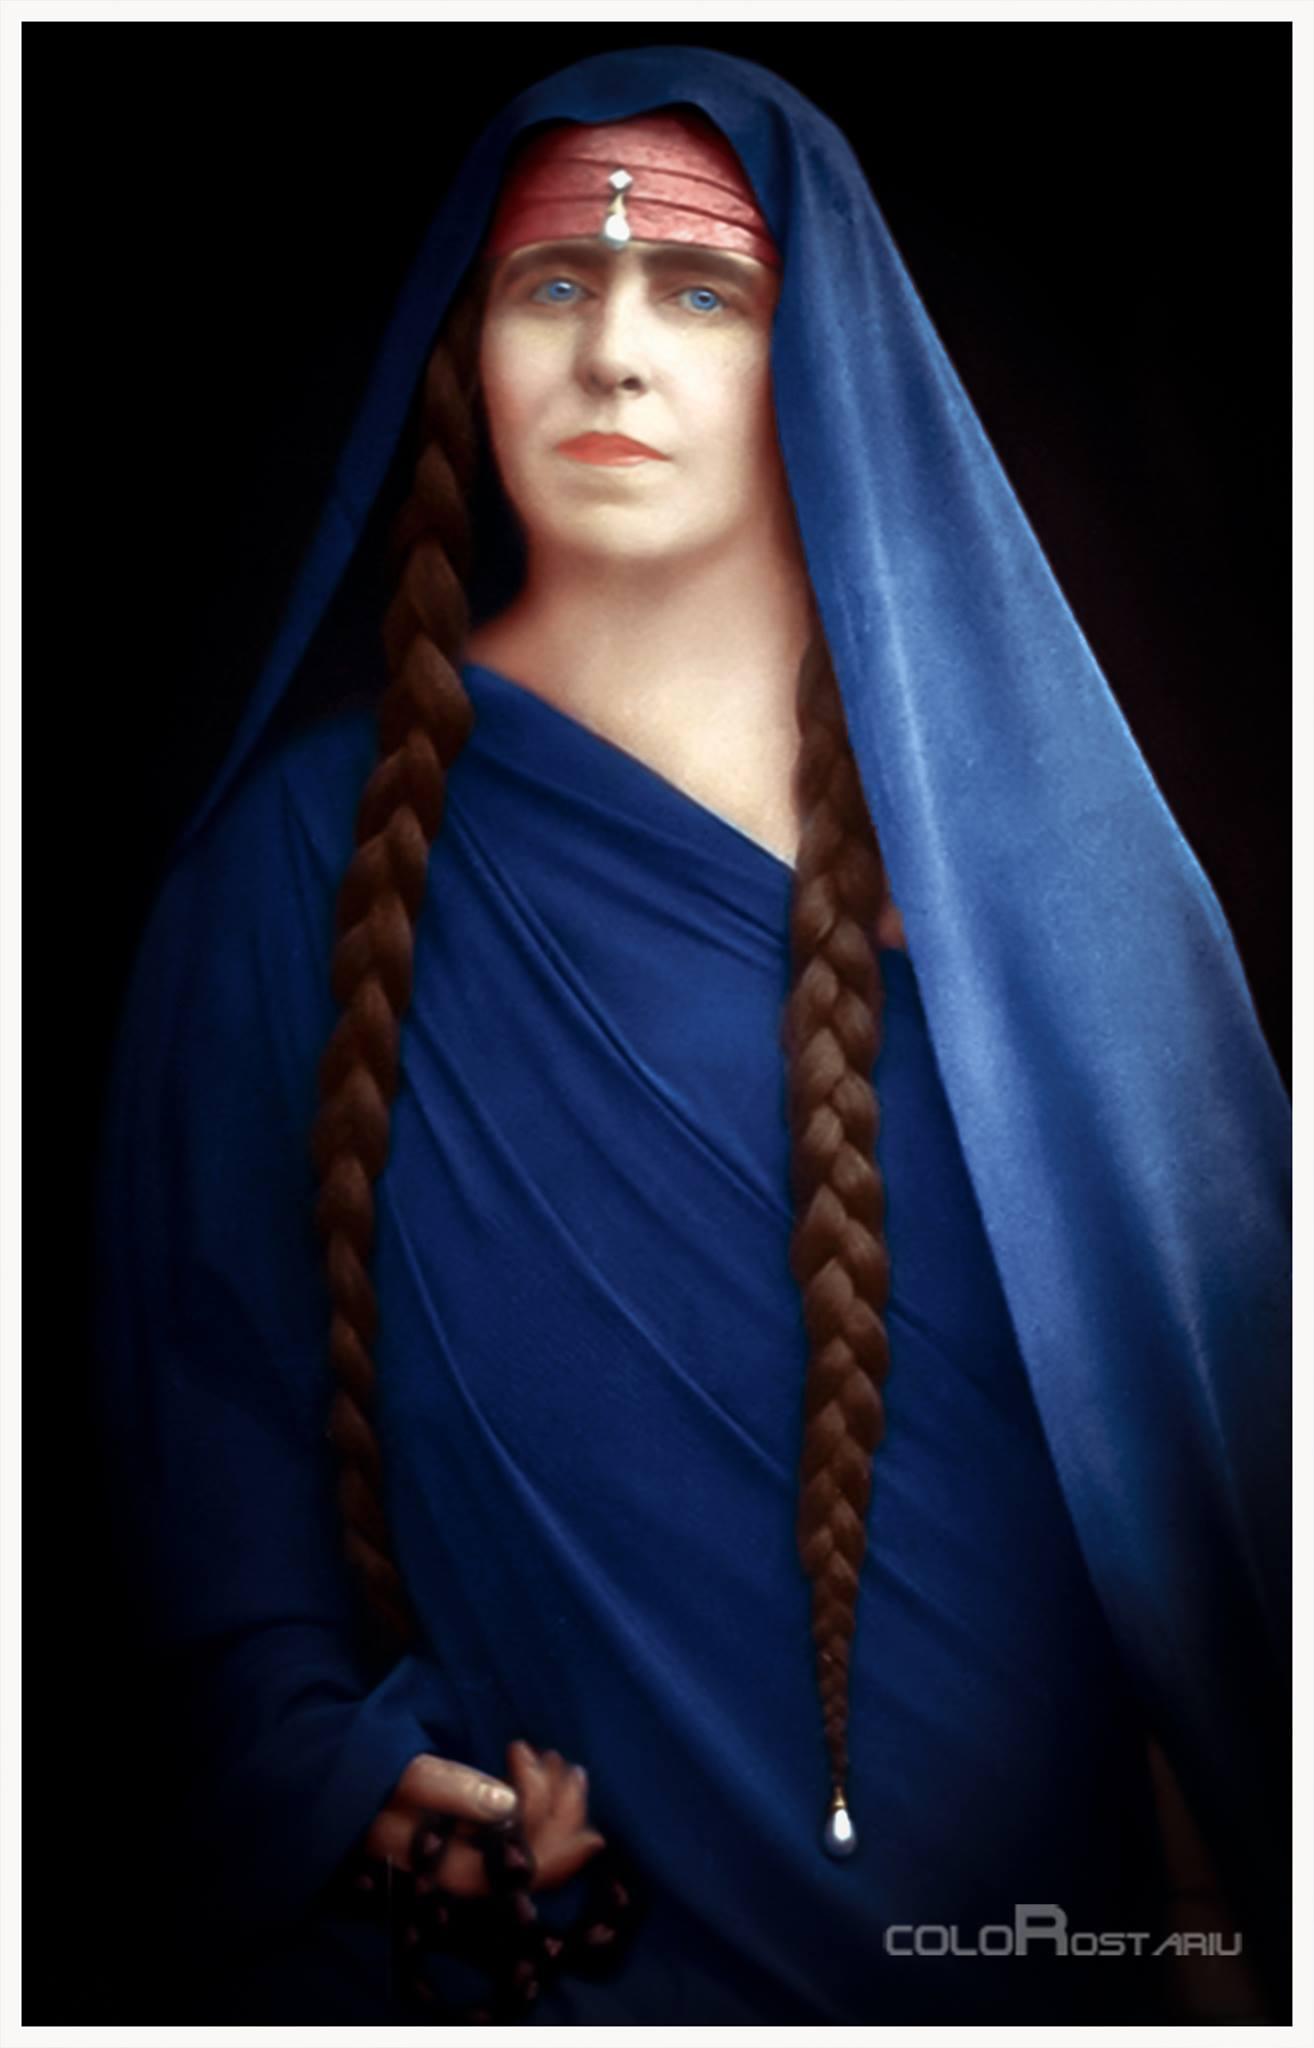 marie-of-romania-regina-maria-regele-ferdinand-carol-the-queen-of-hearts-regina-inimilor-ww1-world-war-one.jpg